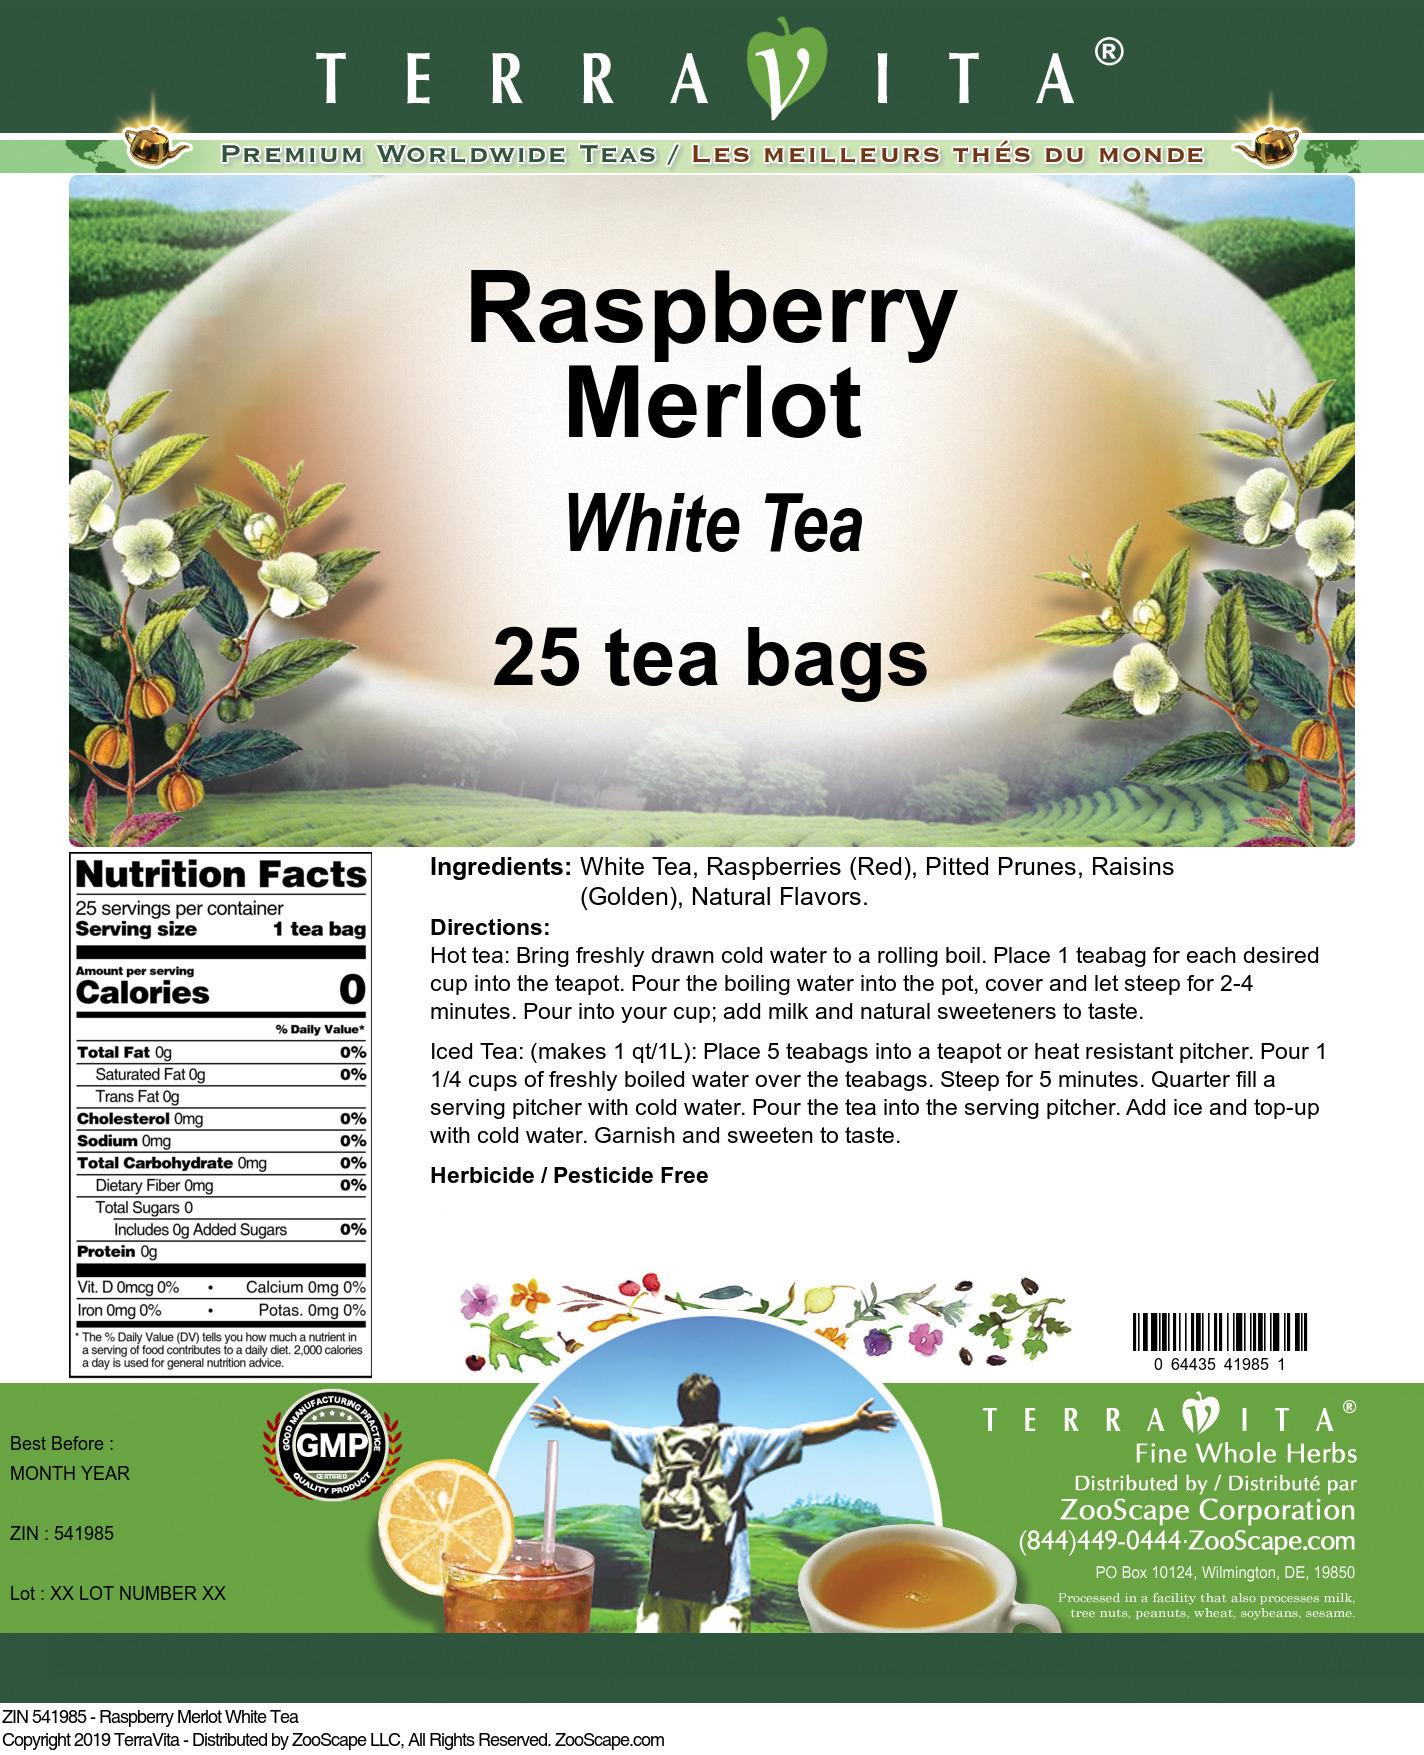 Raspberry Merlot White Tea